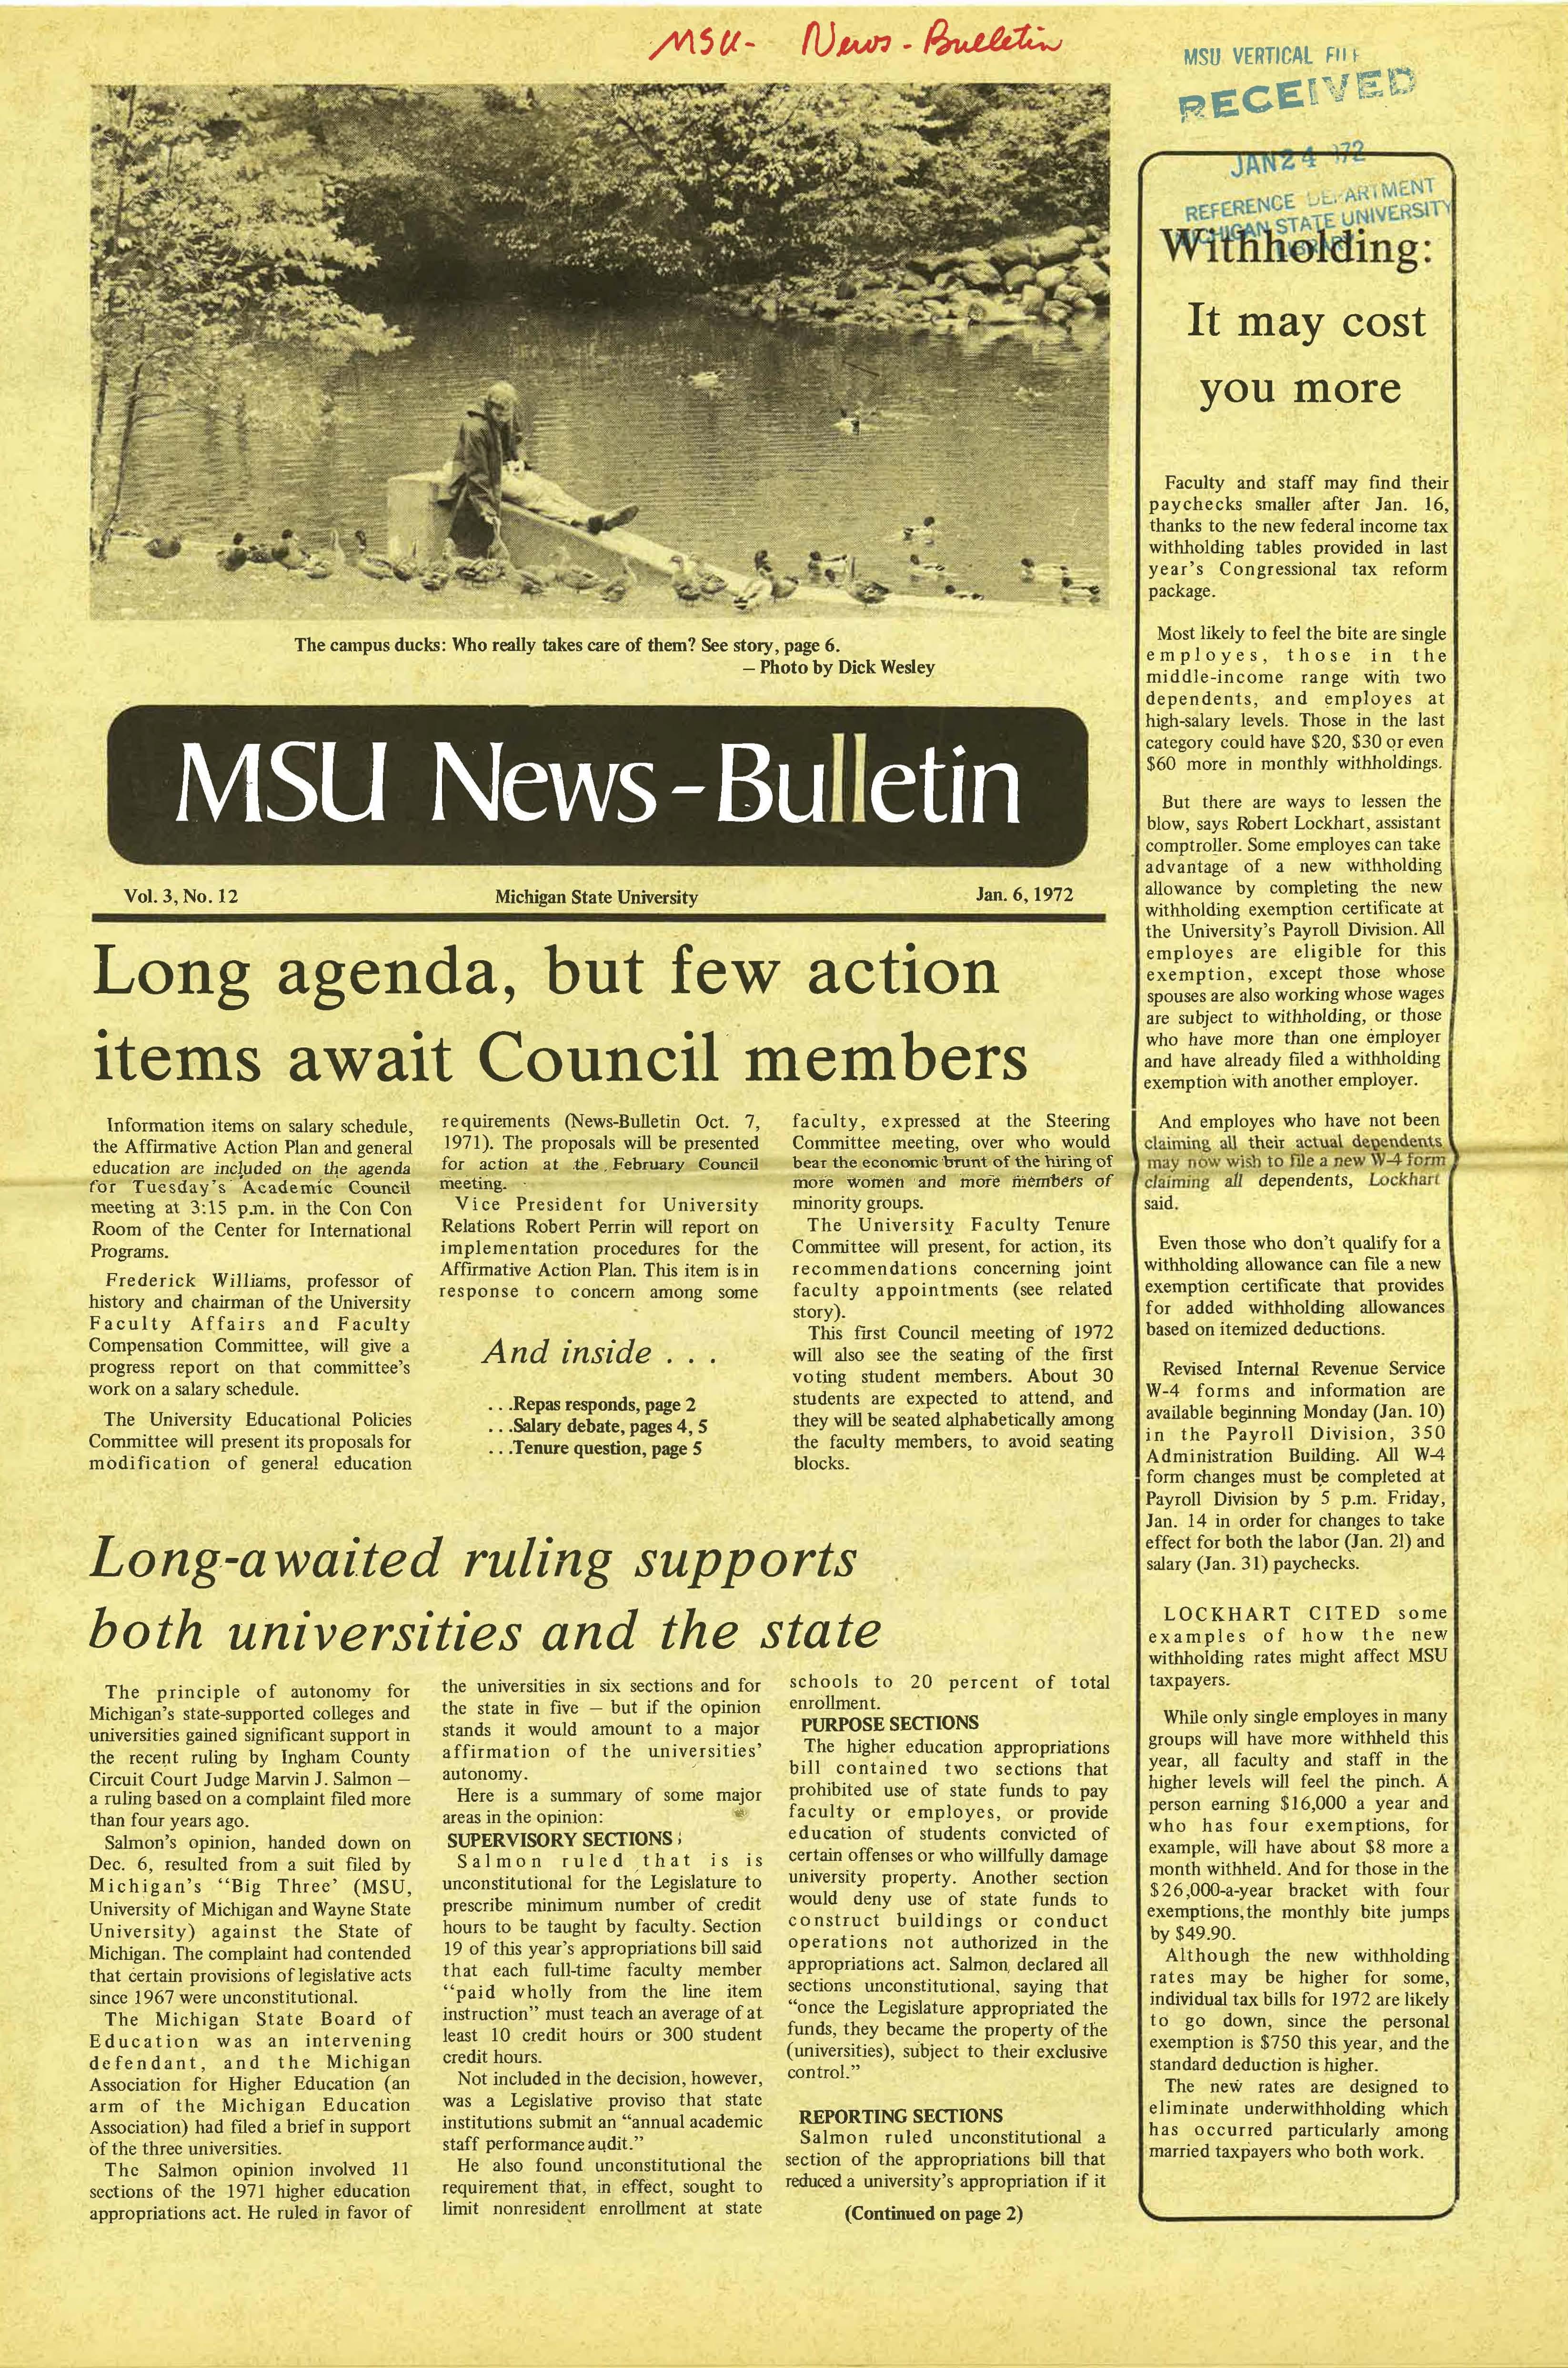 MSU News Bulletin, vol. 4, No. 05, October 19, 1972